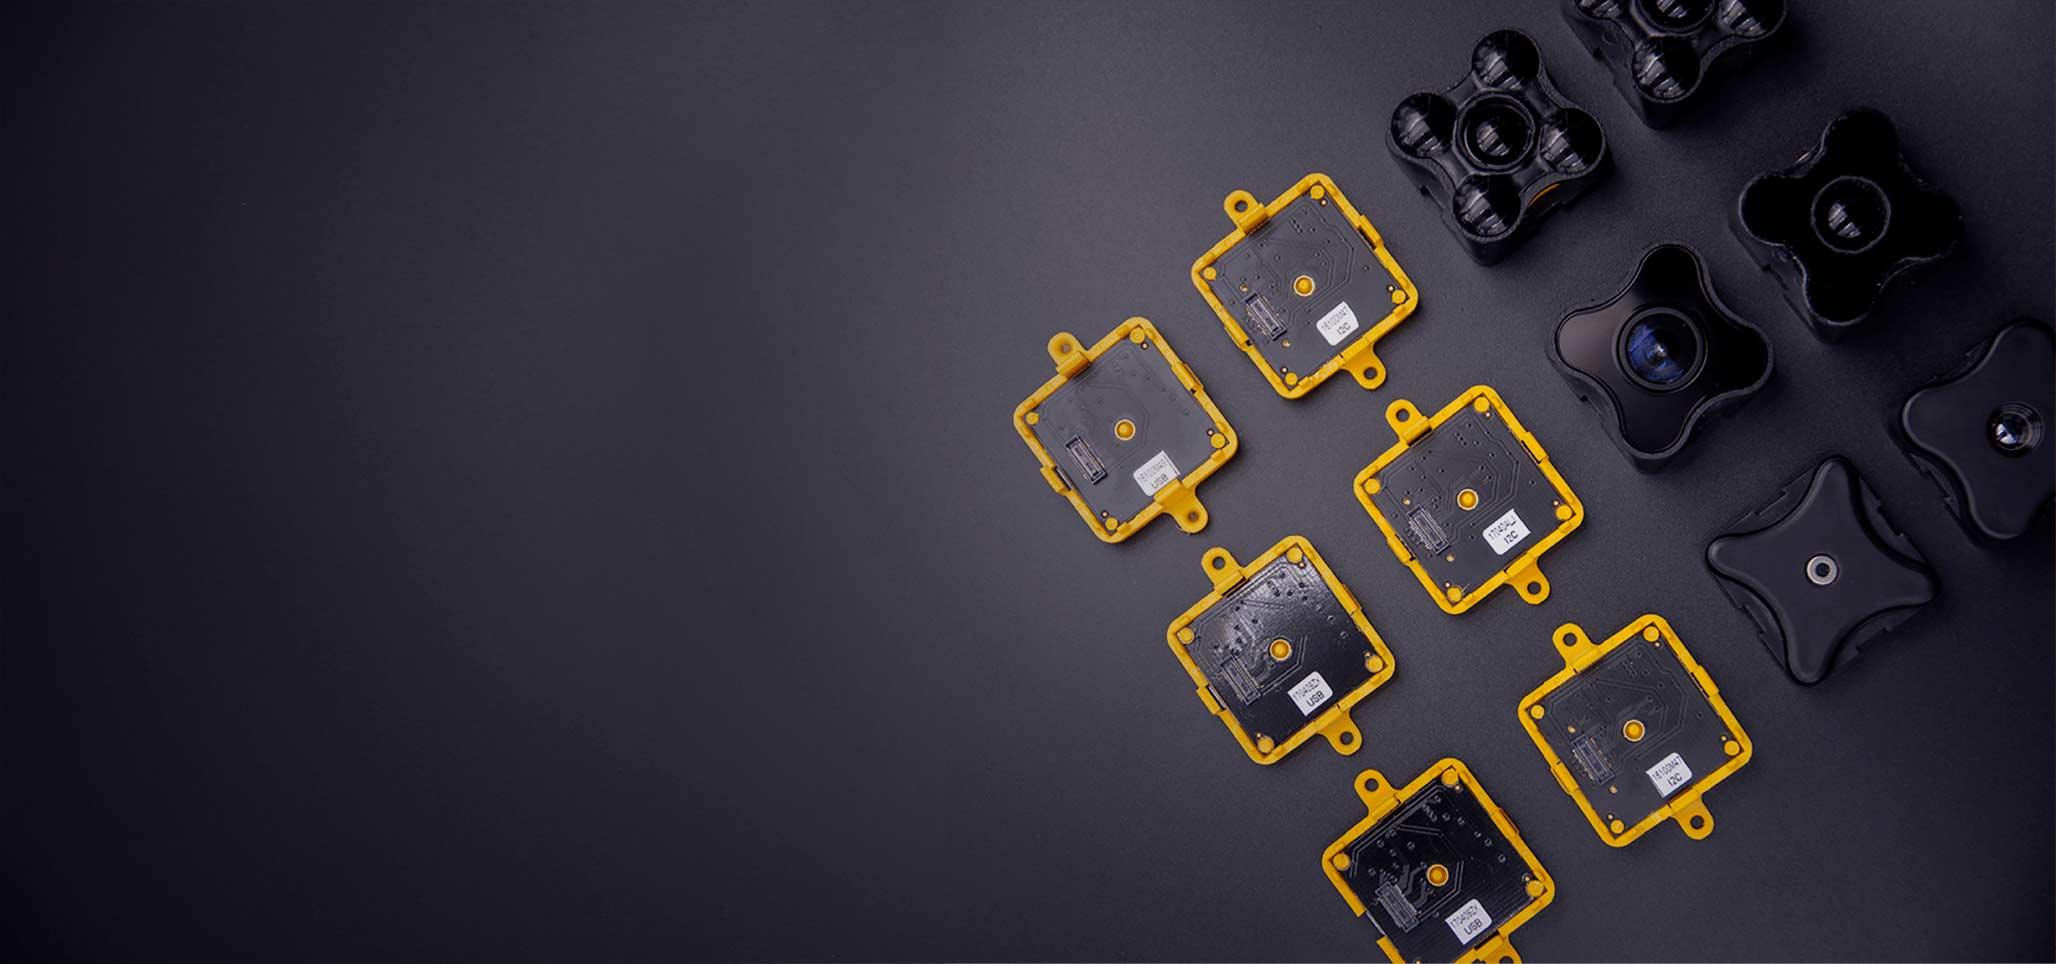 Terabee Teraranger Evo High Performance Time Of Flight Distance Sensors 1